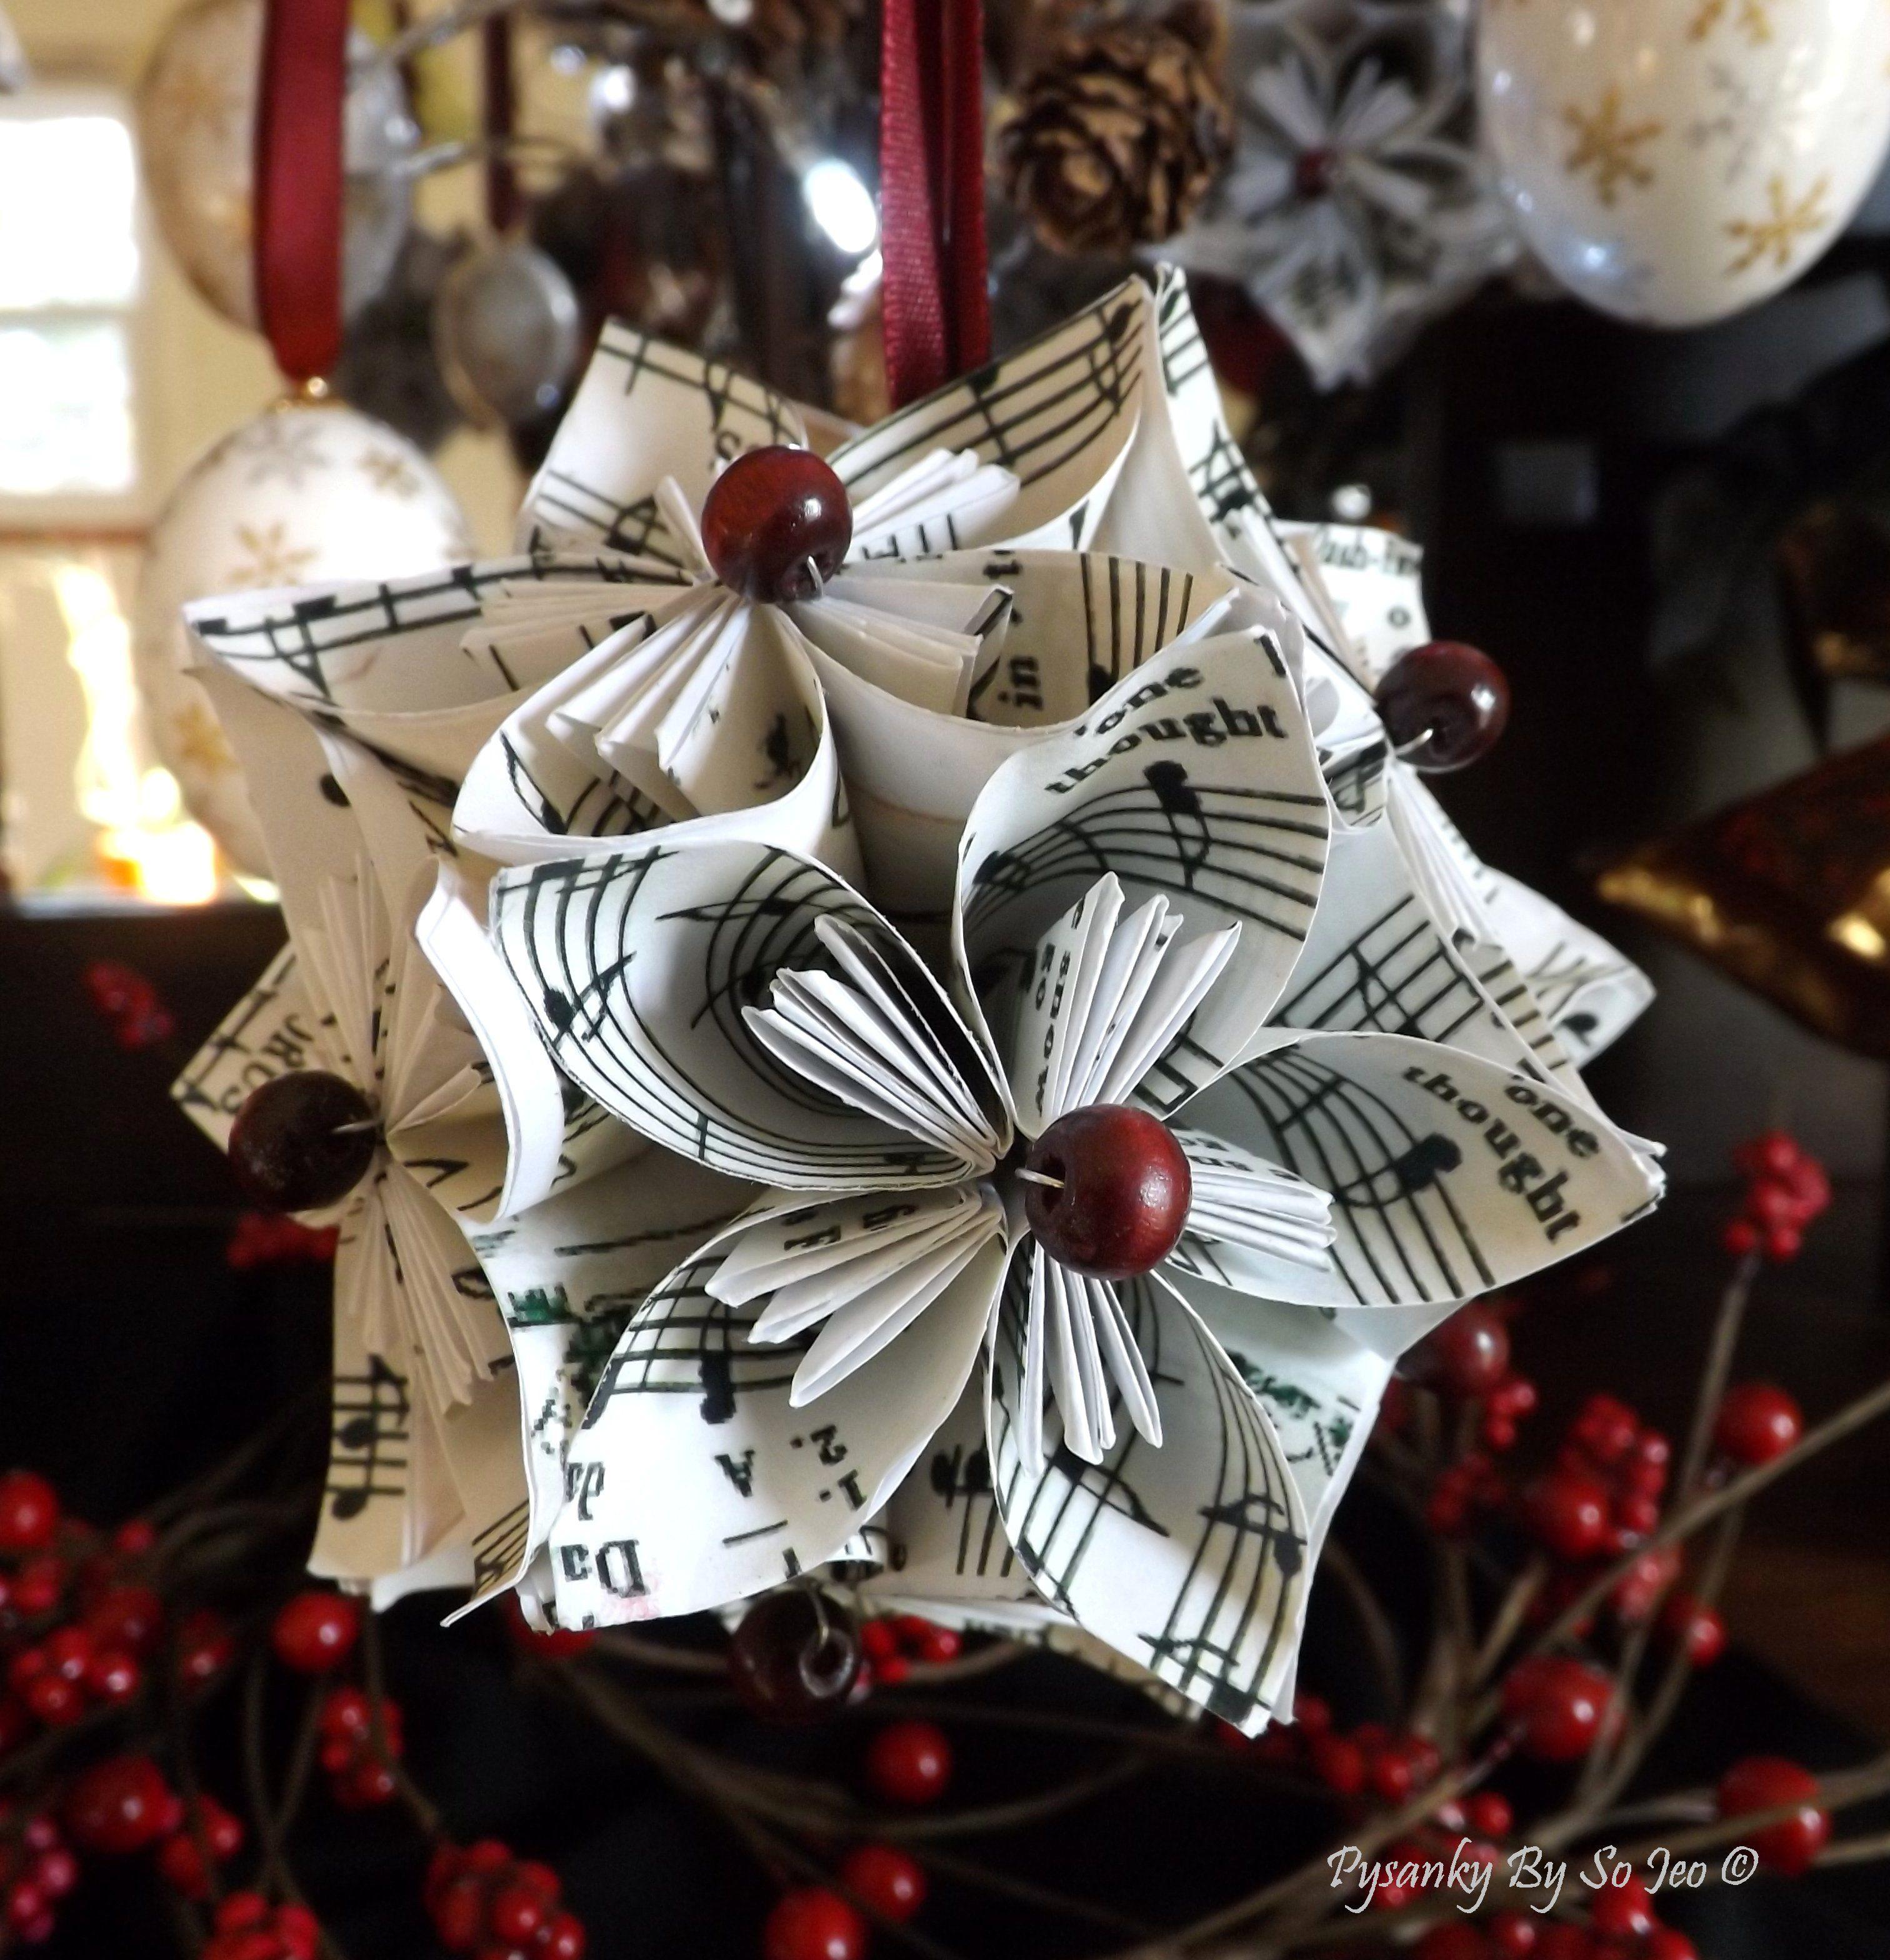 Papercraft Christmss Decor Jingle Bells Kusudama Japanese Origami Christmas Tr Diy Christmas Tree Ornaments Christmas Crafts For Gifts Christmas Origami